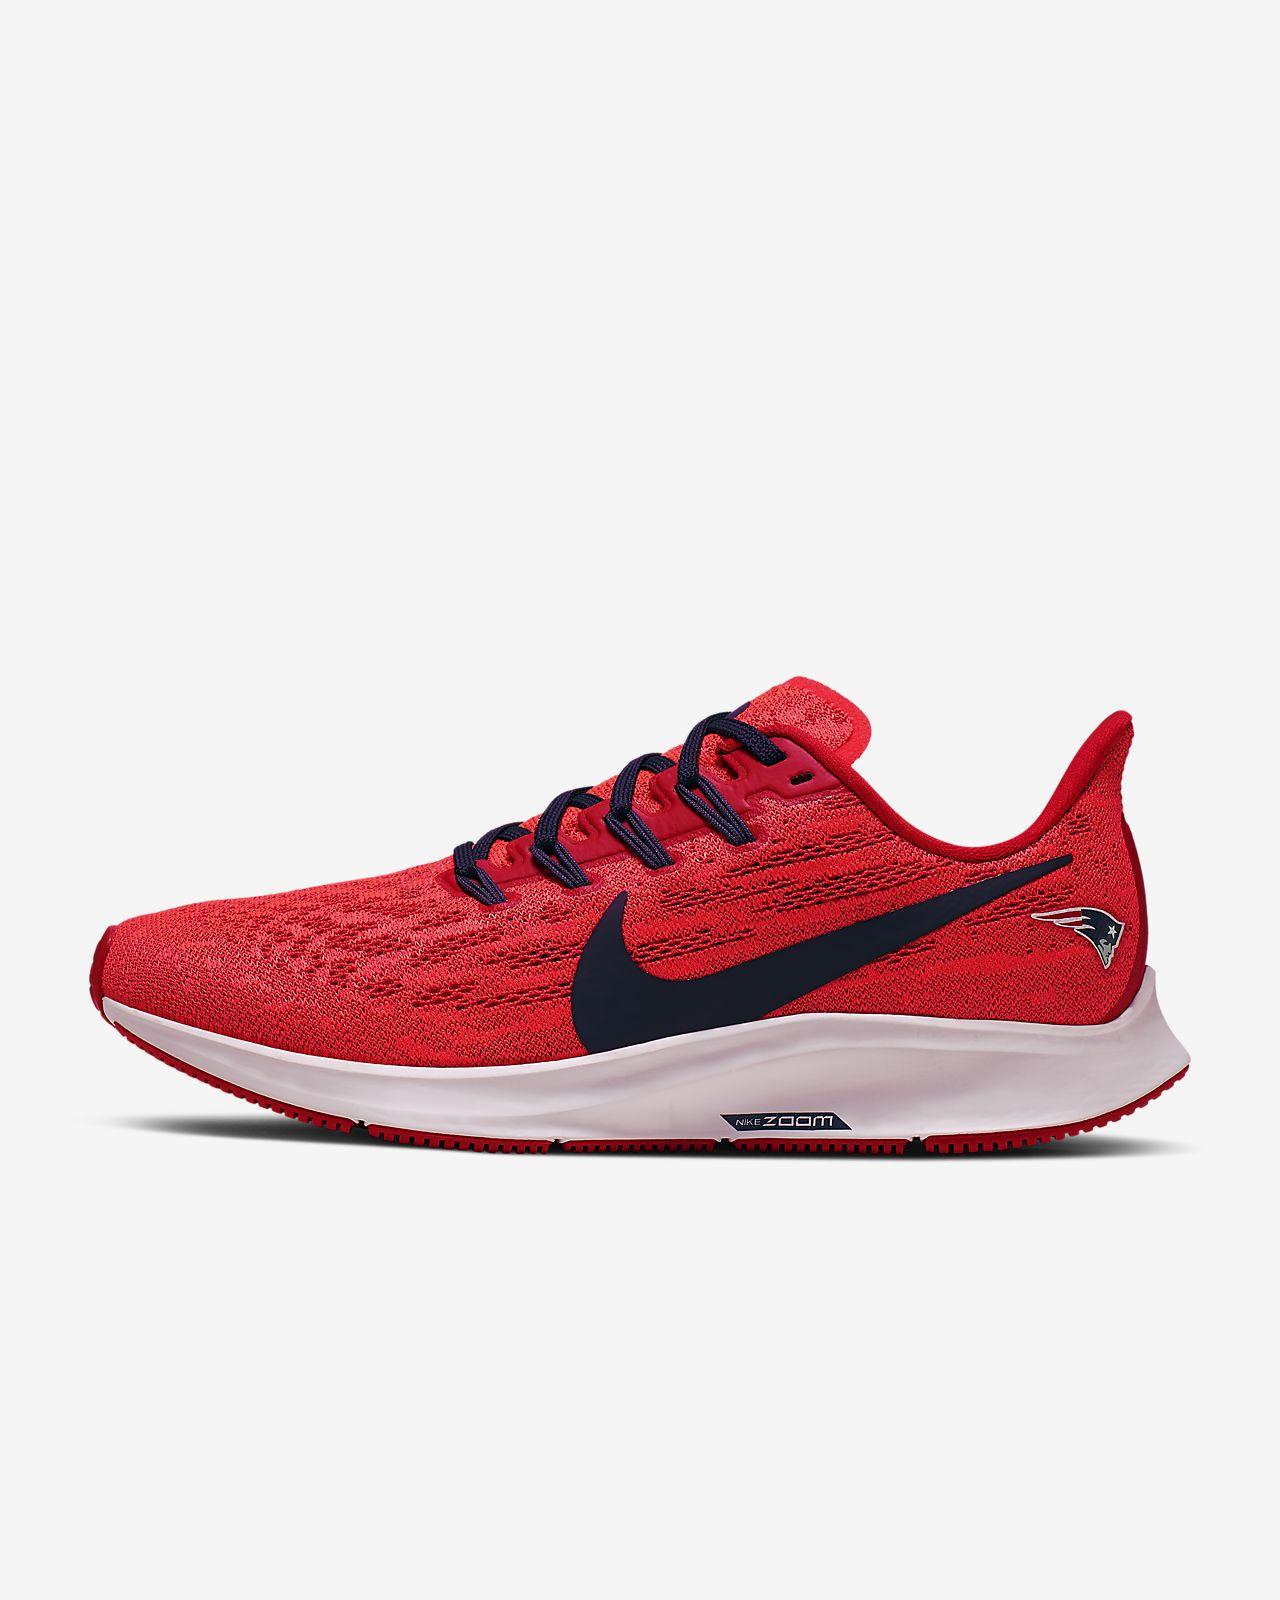 Nike Air Max Invigor Print 95 Pink Black White Womens Running Shoes NIKE ND001720